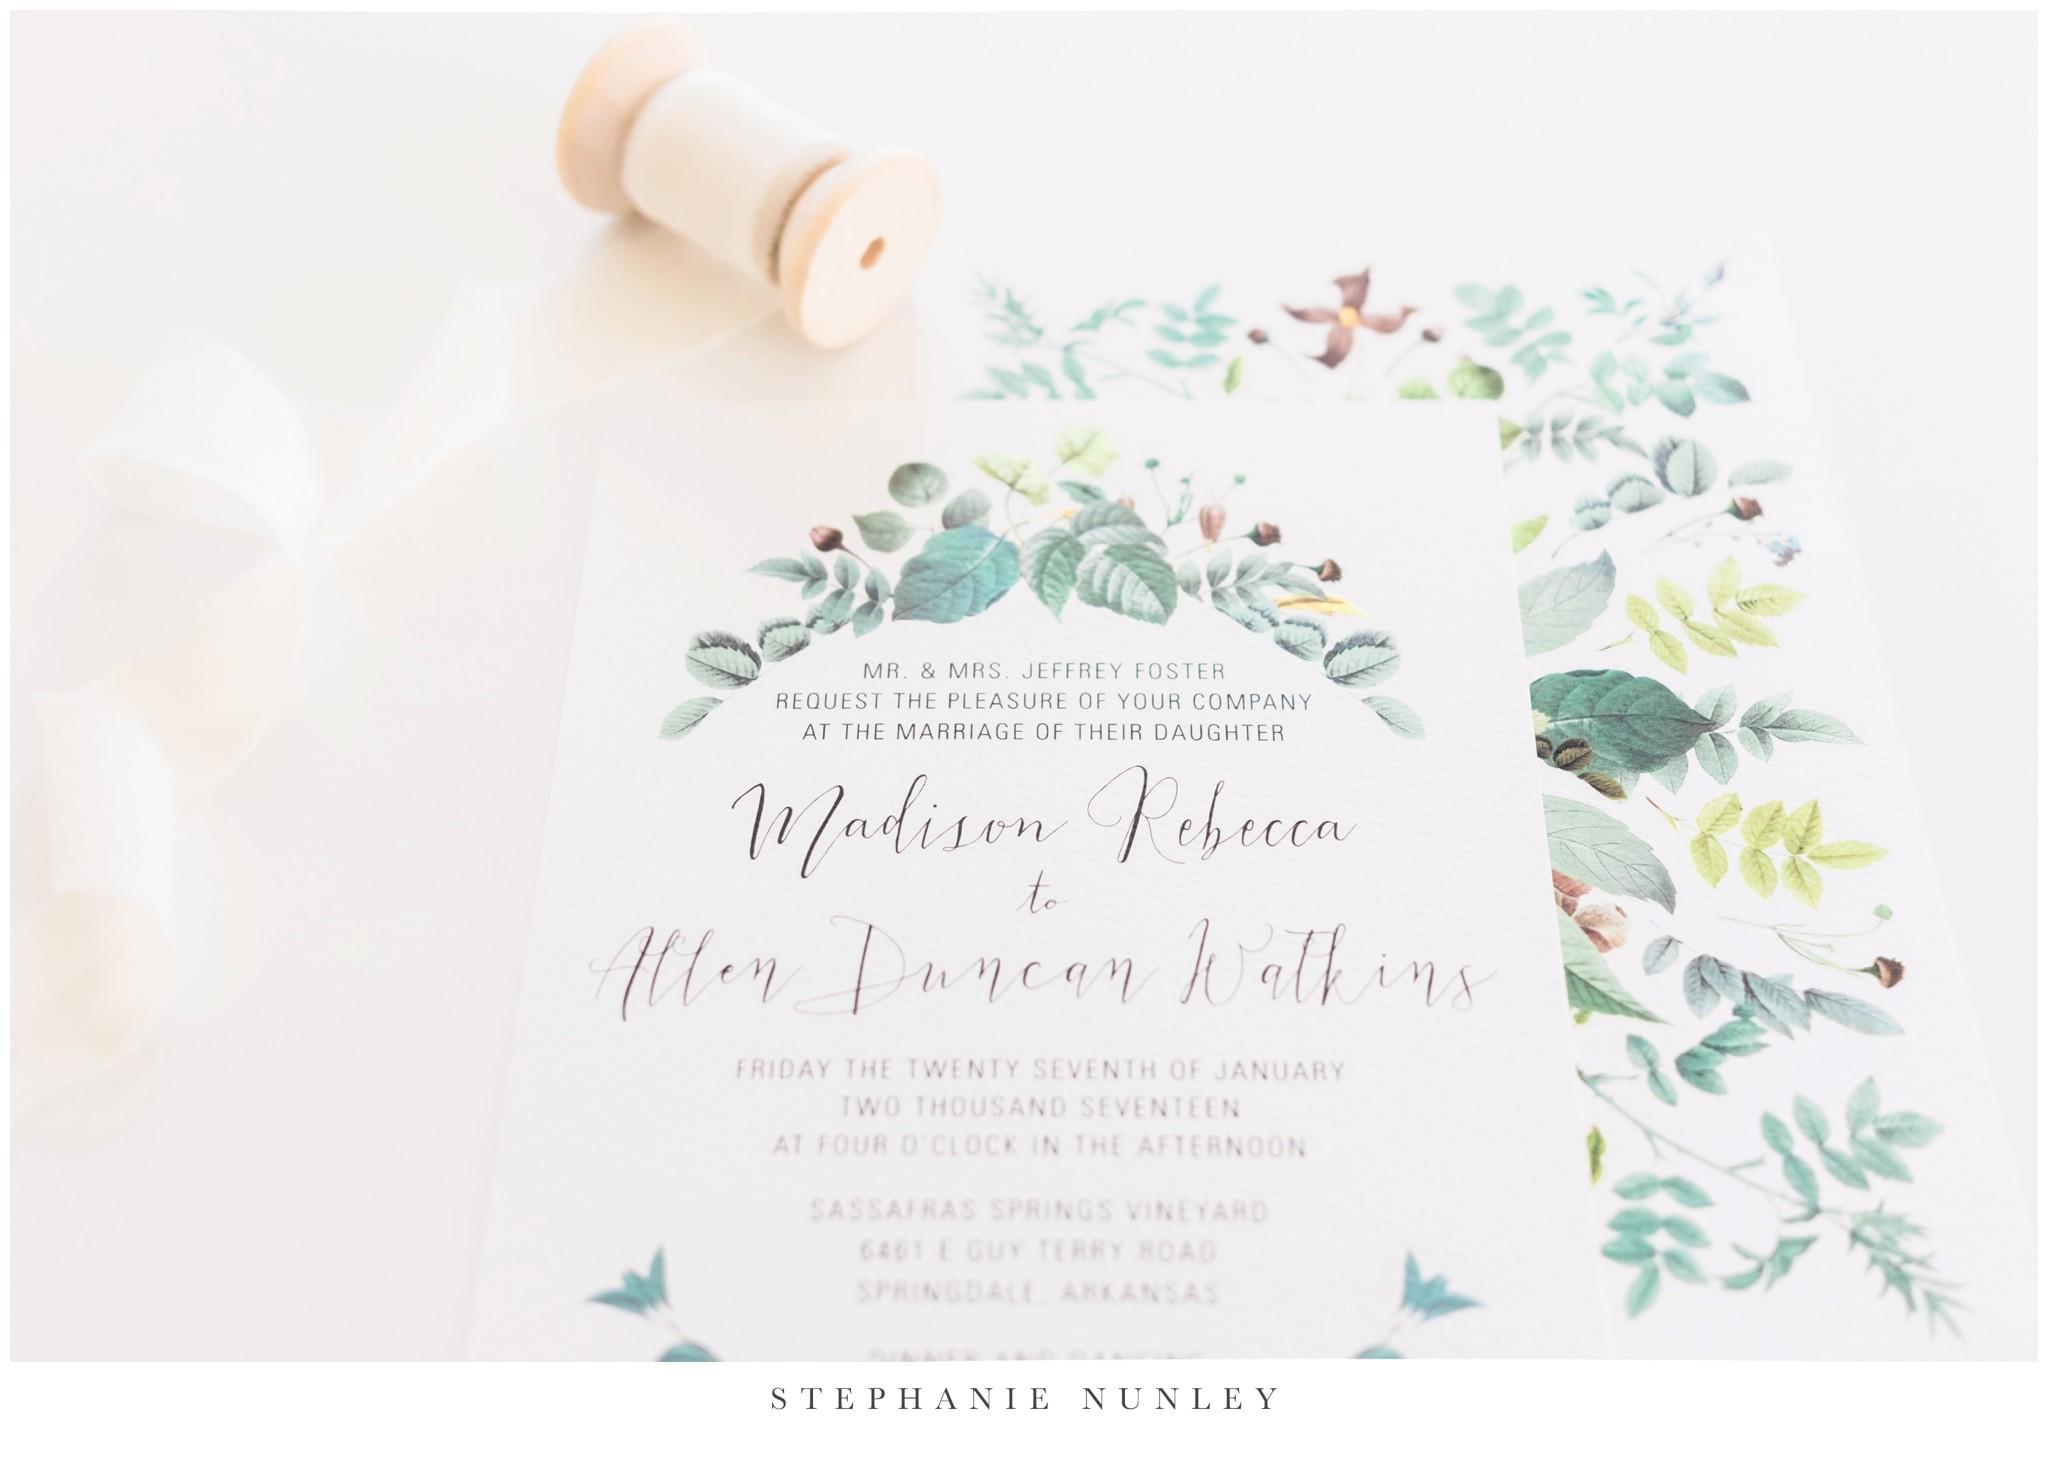 sassafrass-springs-vineyard-film-wedding-photos-15.jpg